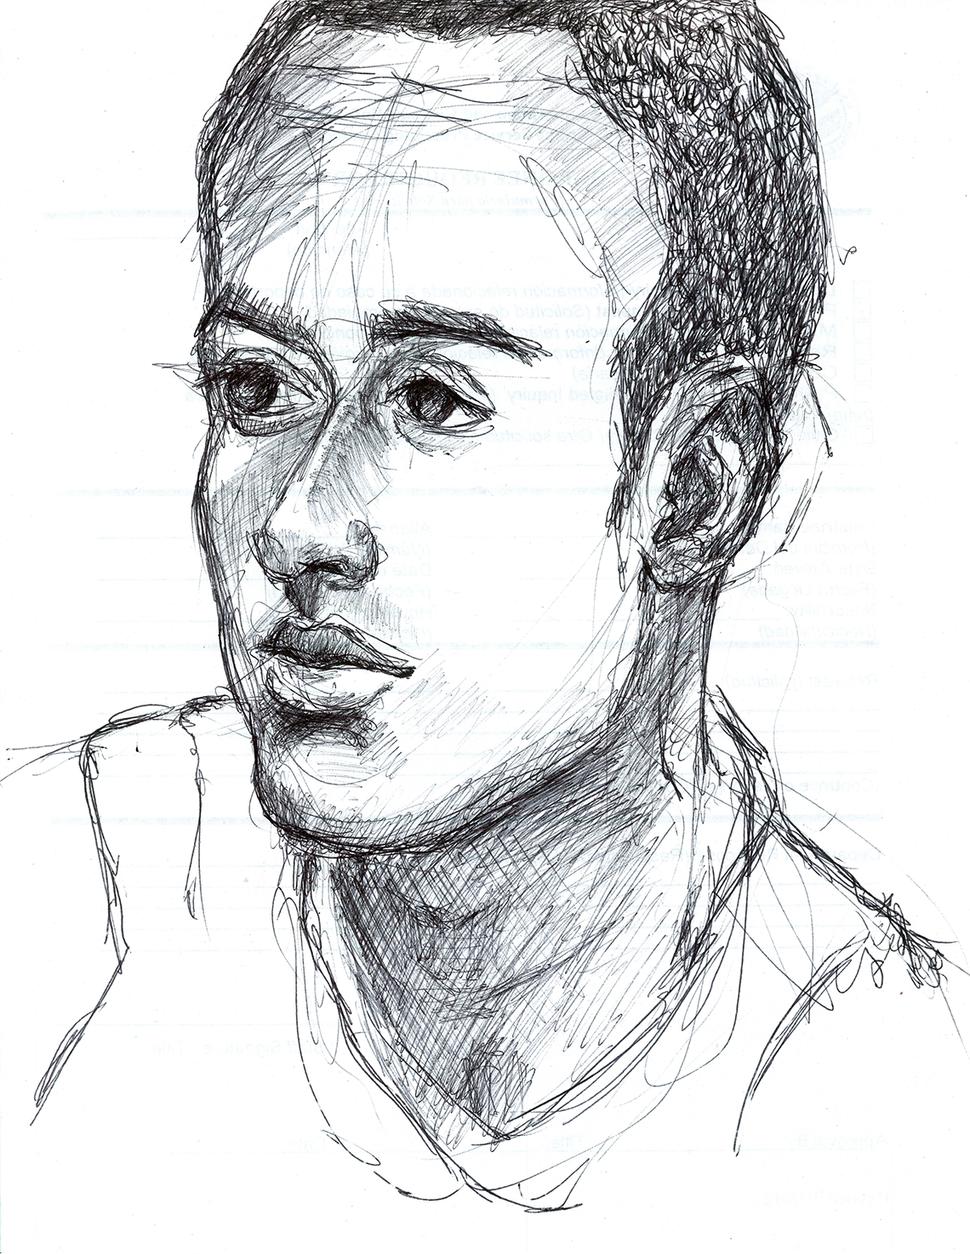 JoséAlvarez (D.O.P.A.) Philip, Brazil, 2012, Ballpoint pen on paper